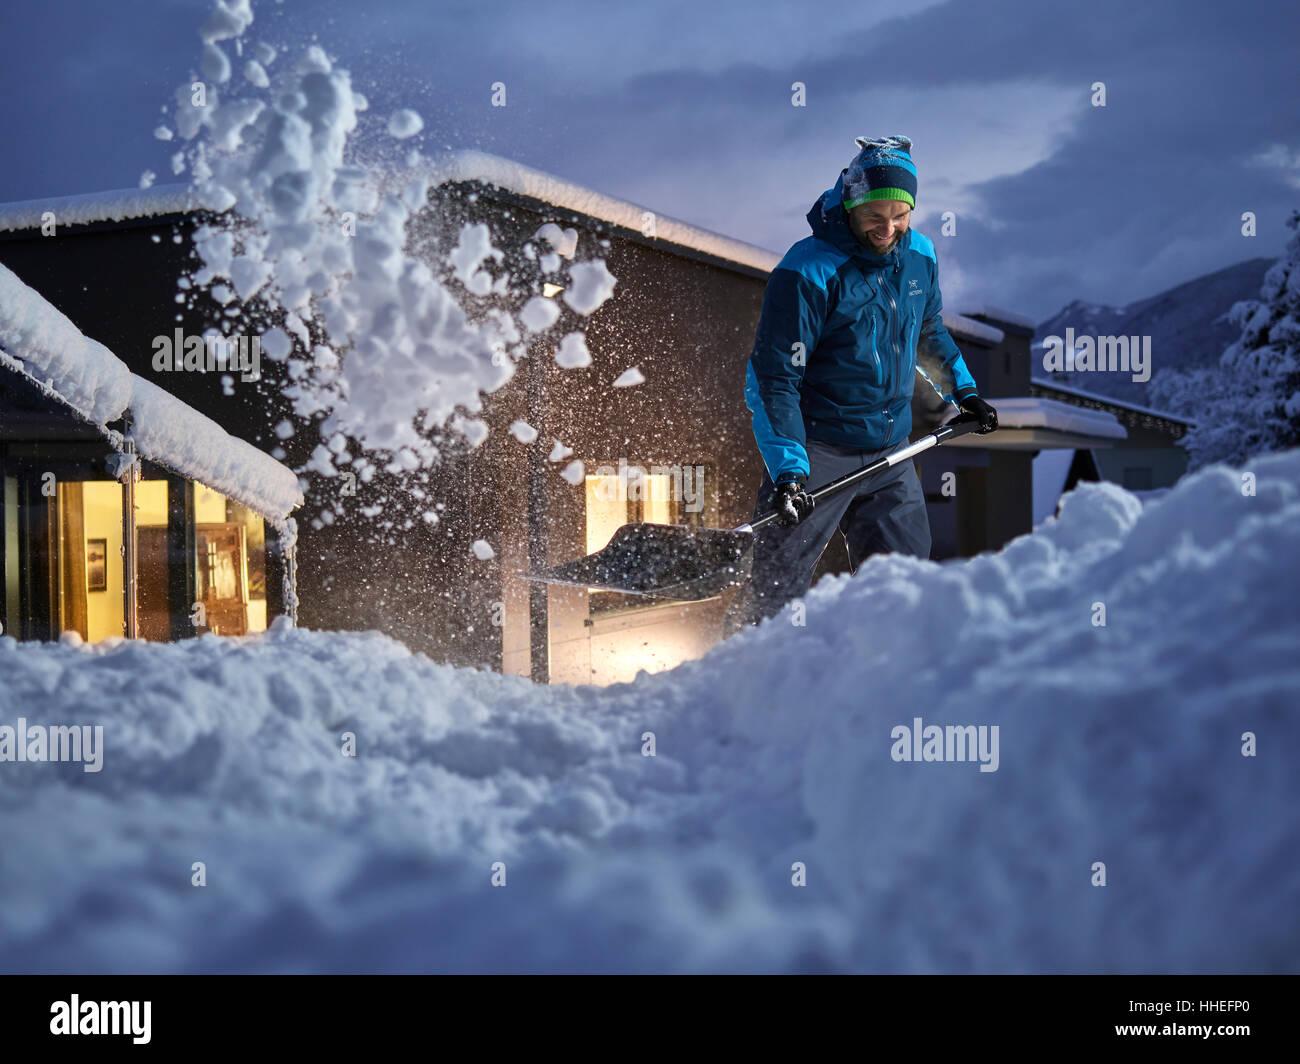 Man, 35-40 years, shoveling snow at dusk, Kolsass, Tyrol, Austria - Stock Image